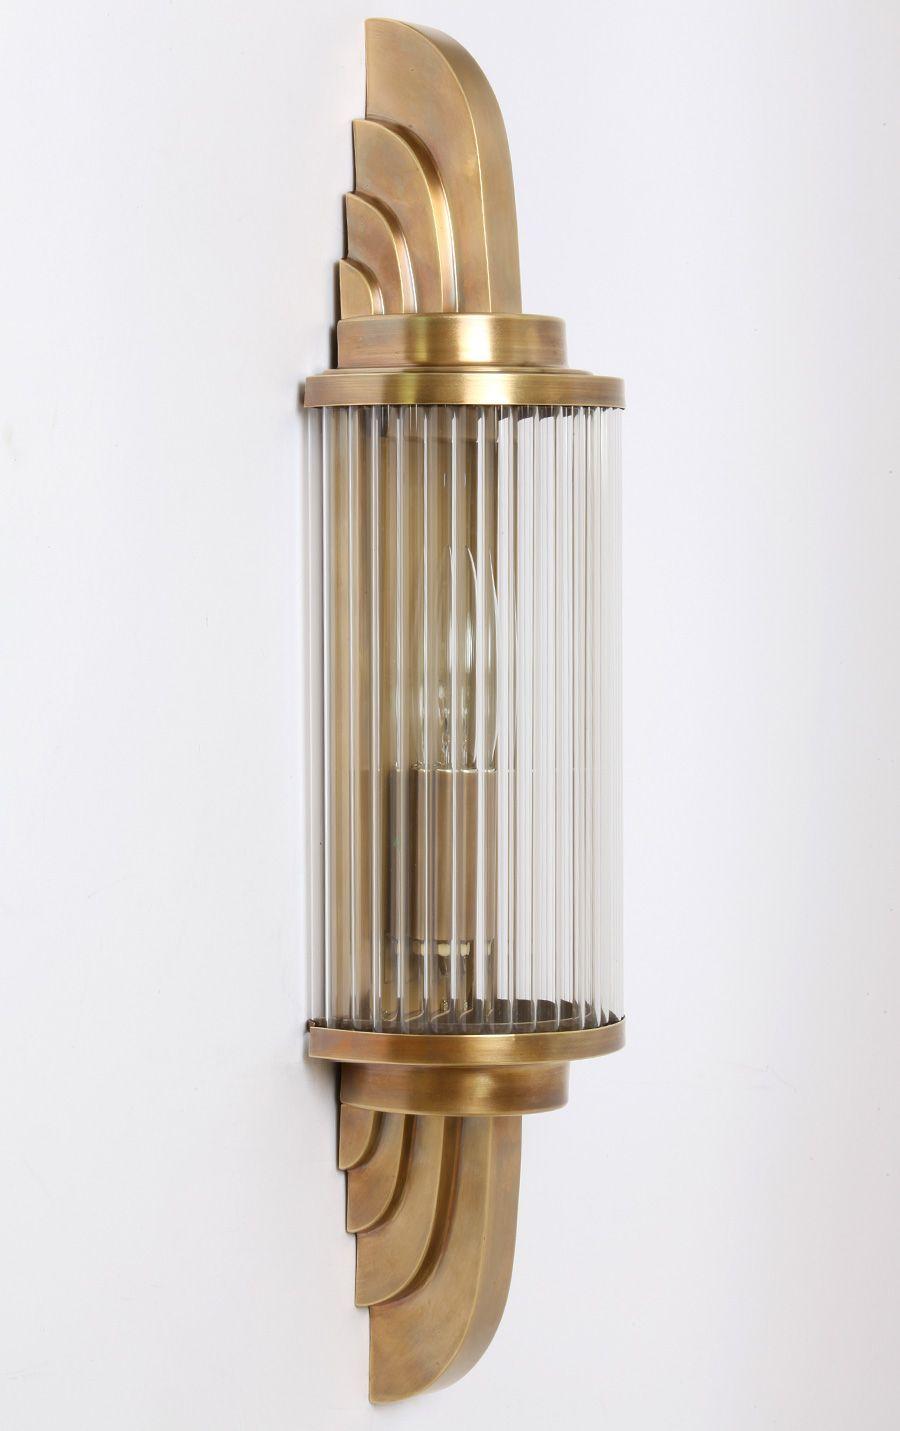 Lampe Art Deco Decor Wall